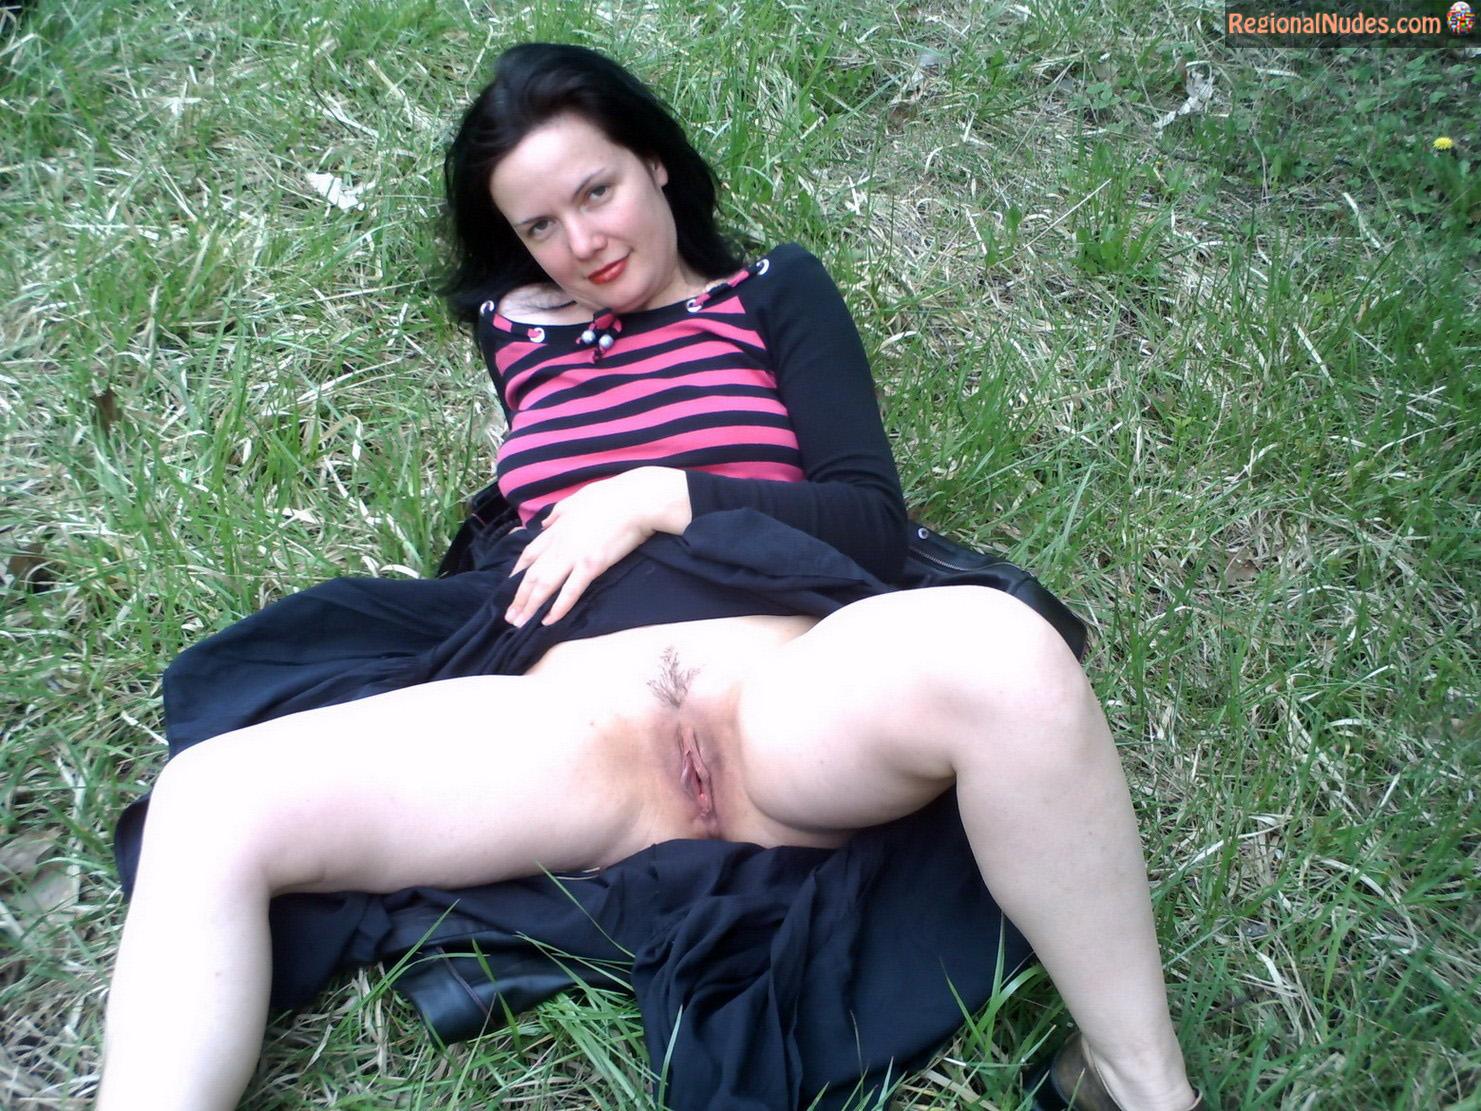 Bulgarian Woman Revealing Cunt On Grass  Regional Nude -6825